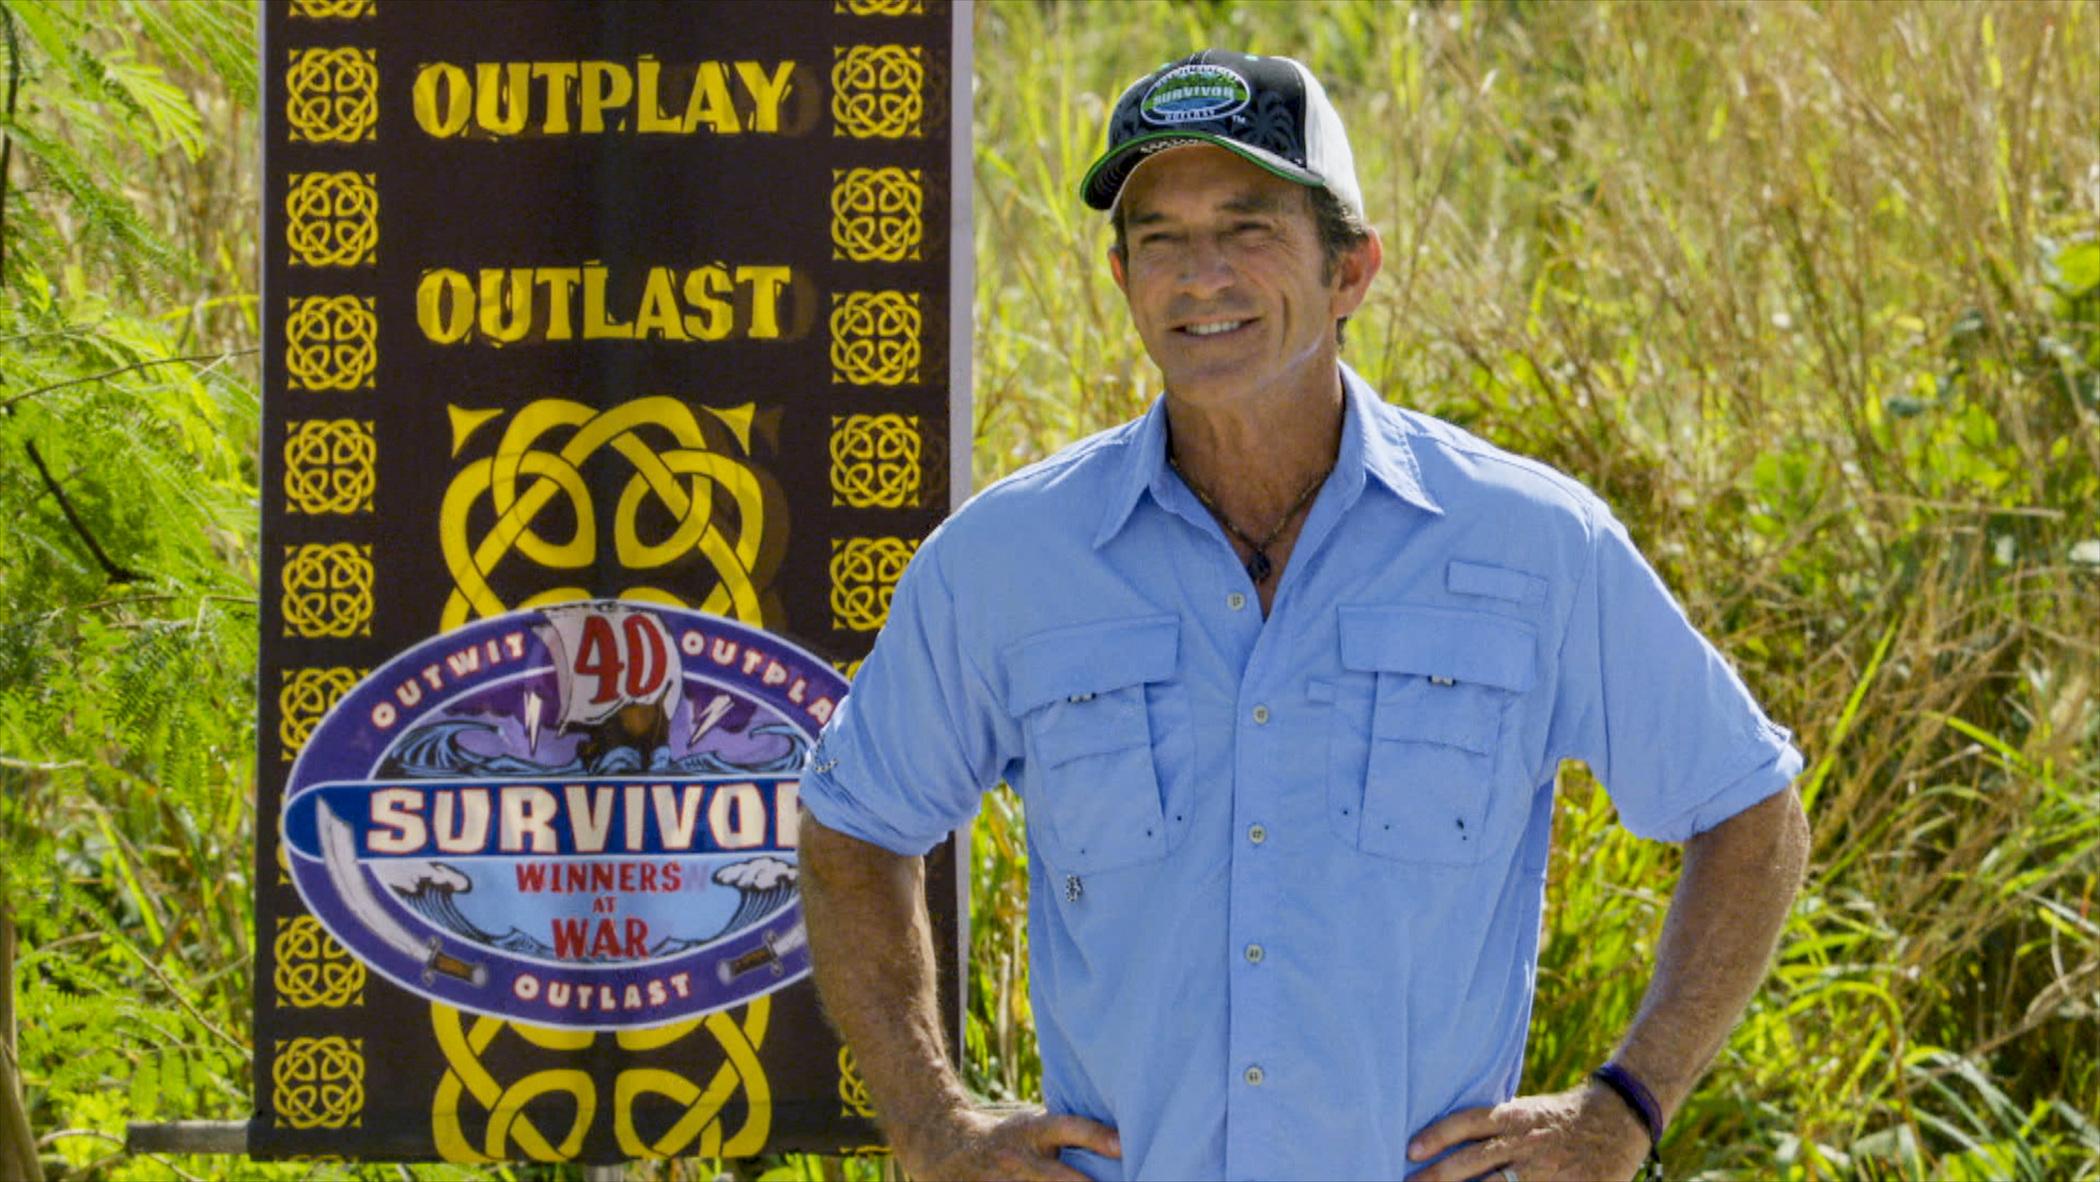 Jeff Probst of Survivor 41 says the show almost filmed in Georgia, not Fiji